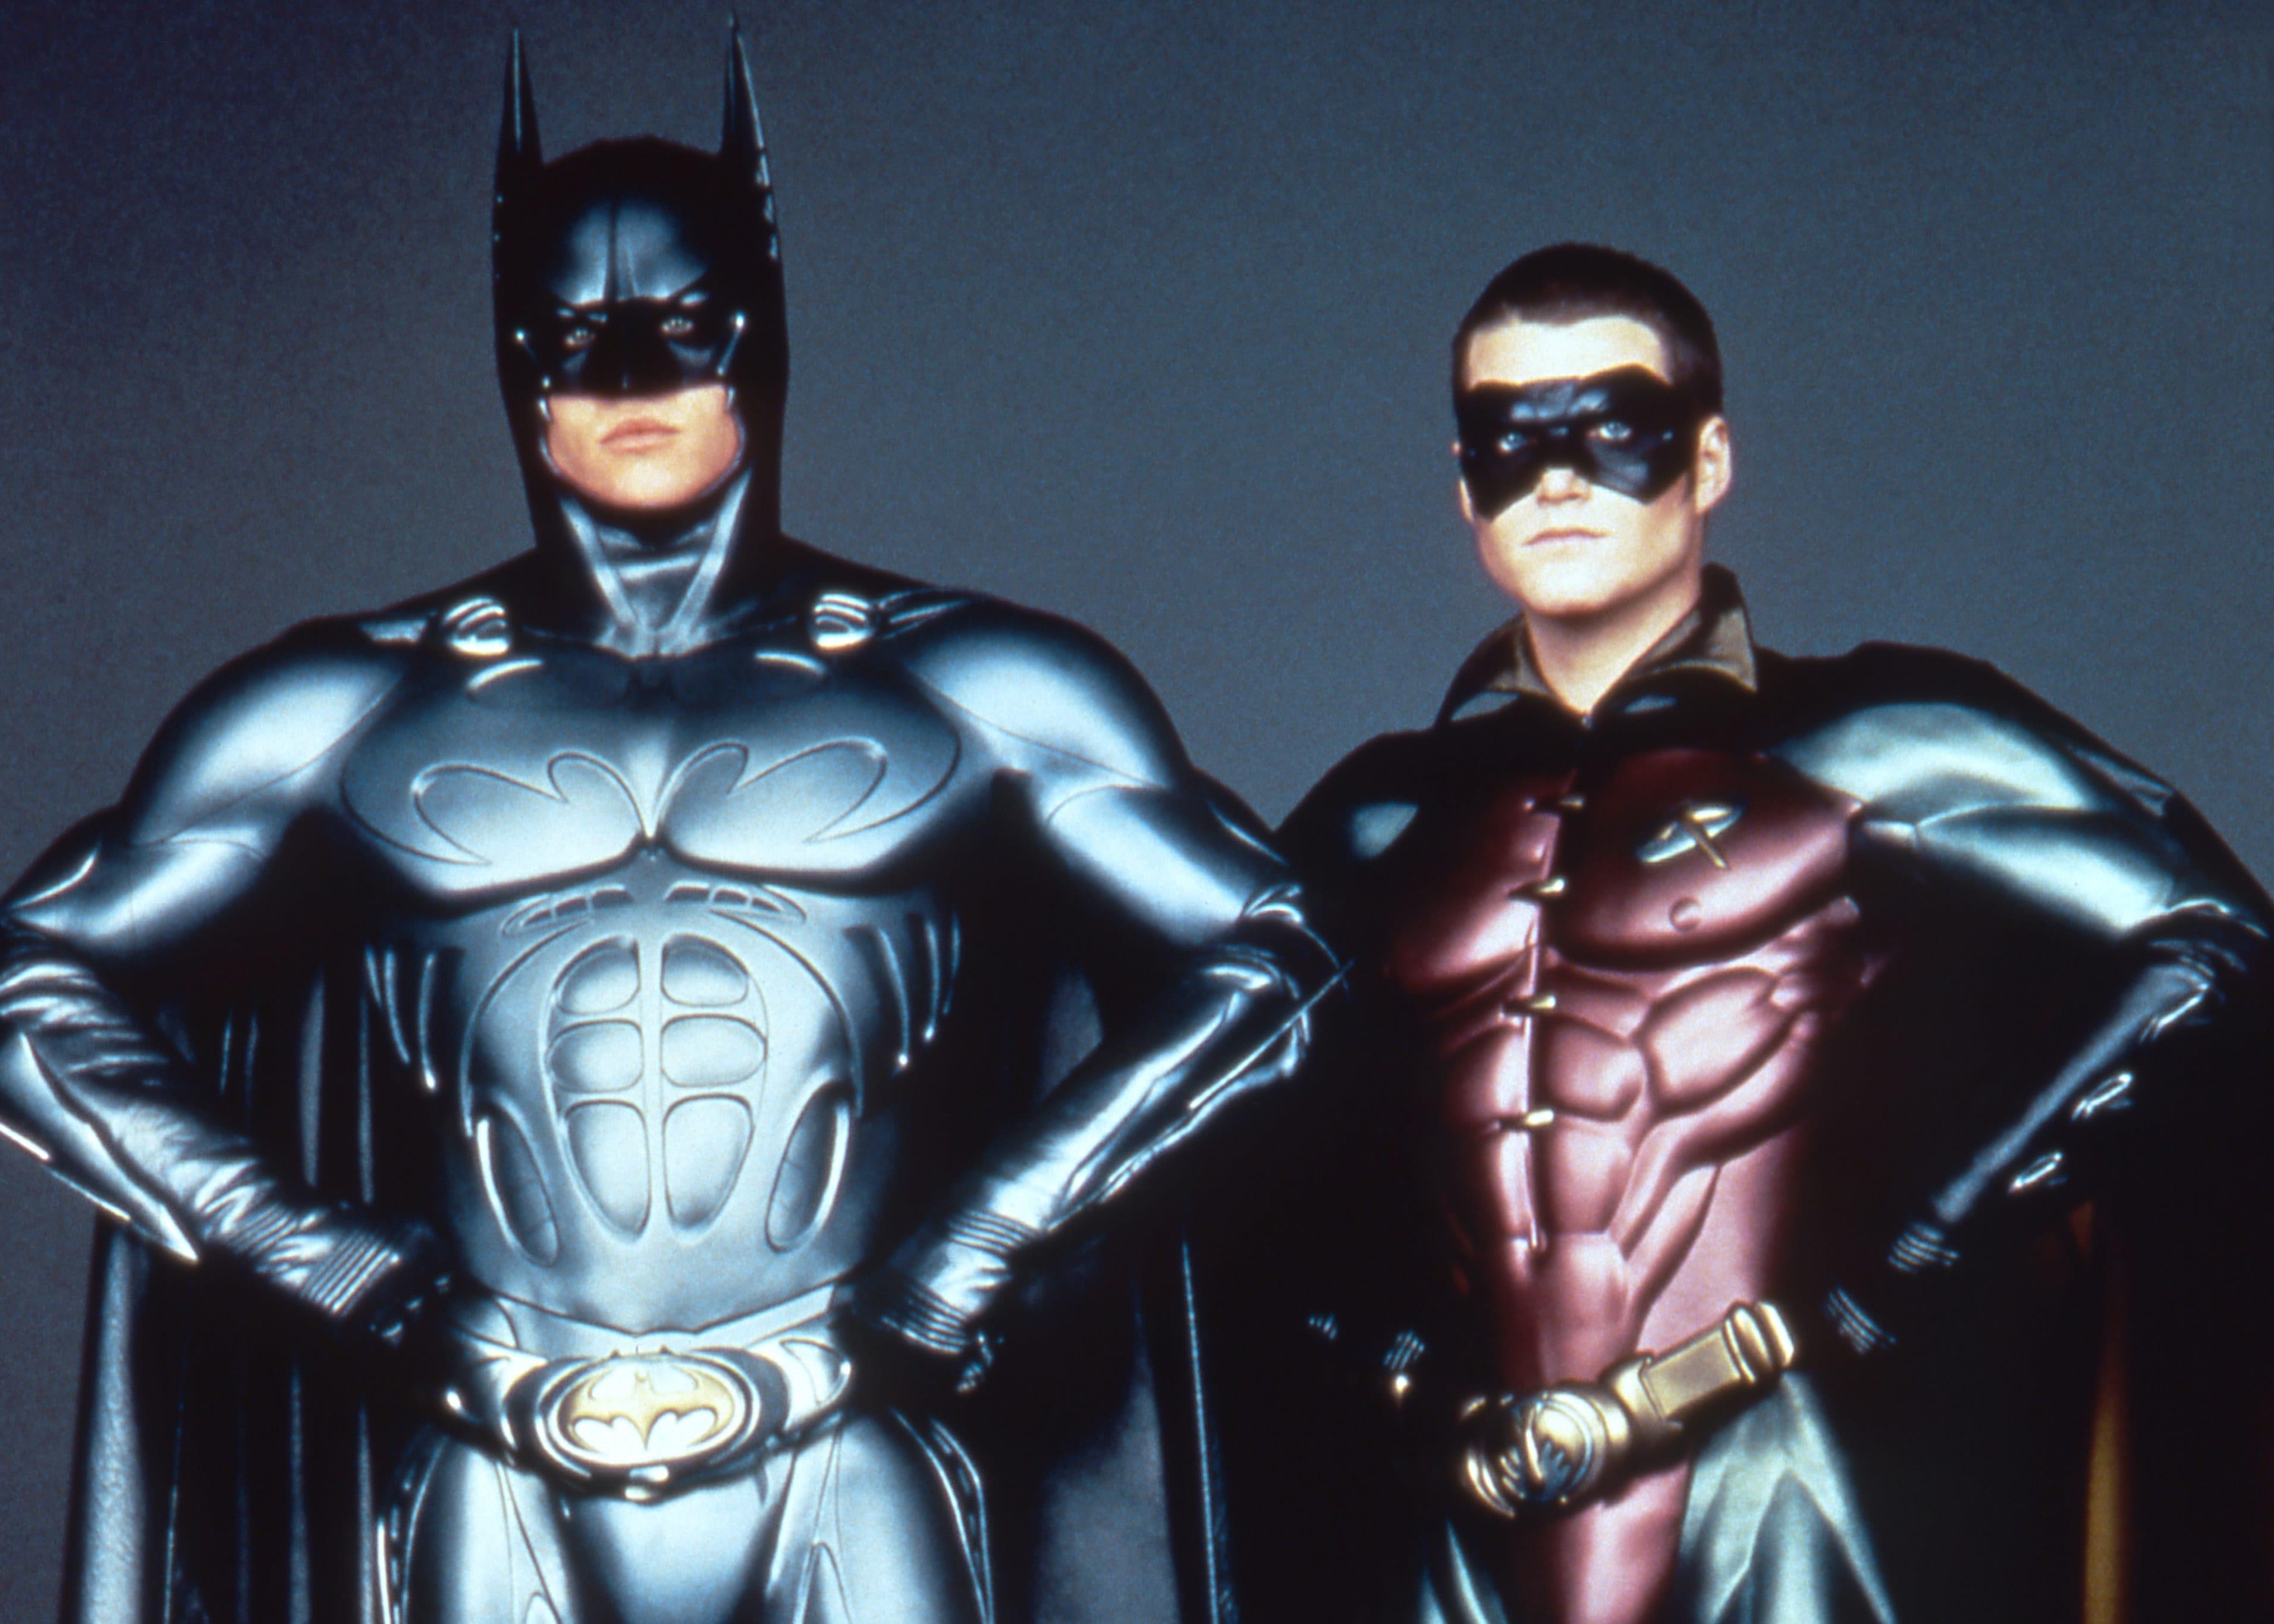 Batman Returns Wallpapers, Pictures, Images